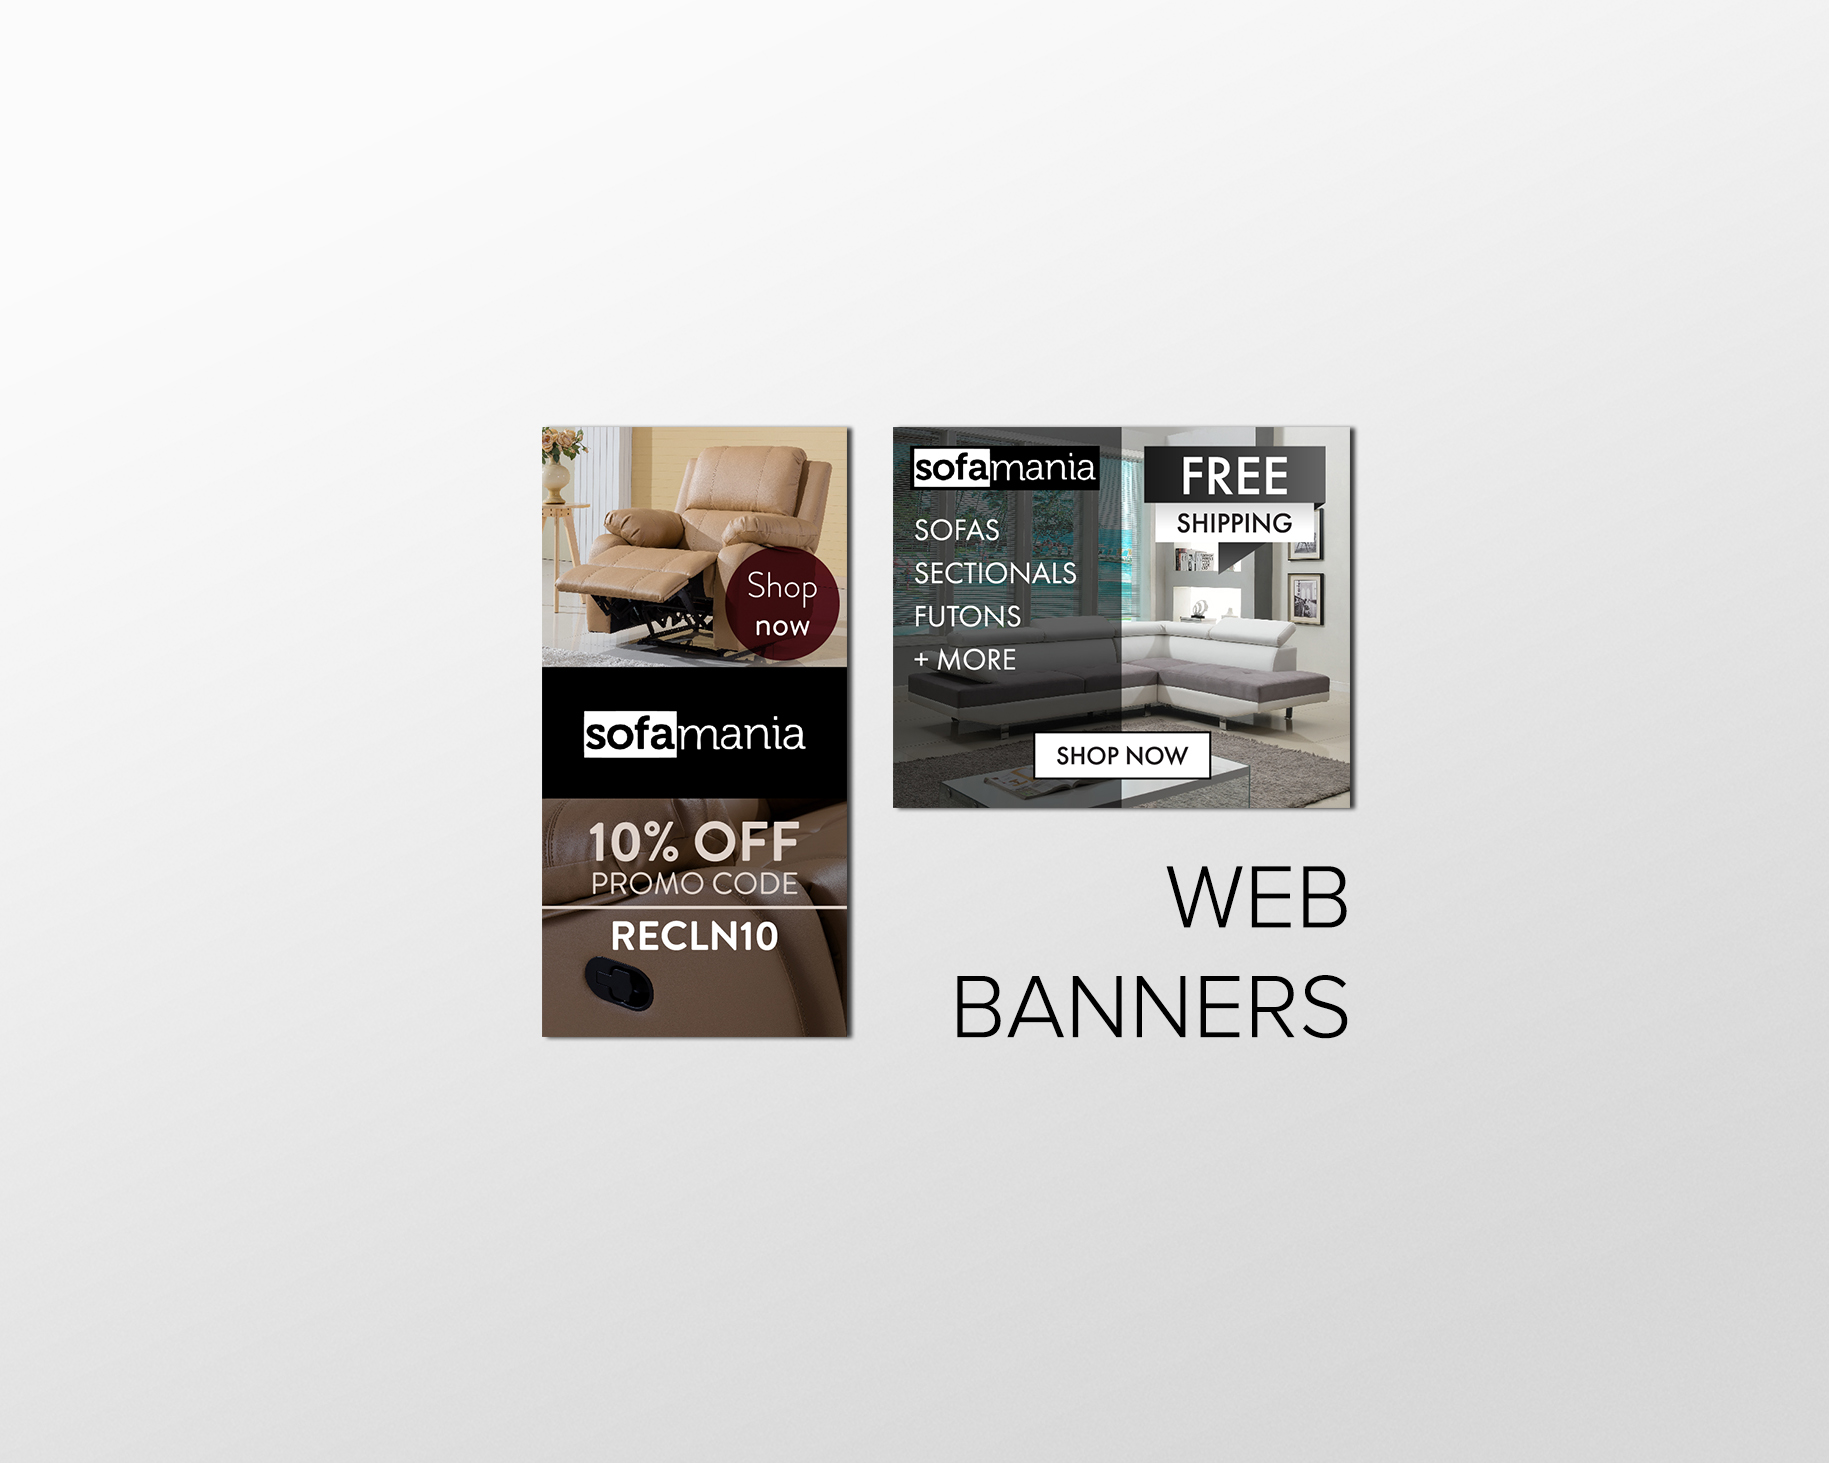 Web-Banners-Image-4.jpg